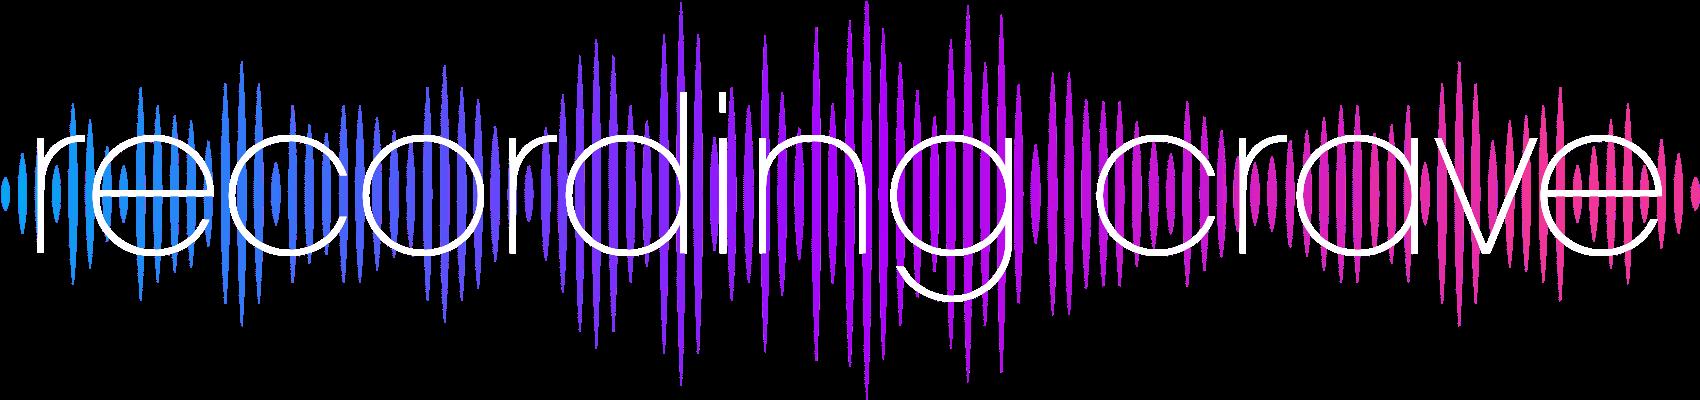 Recording Crave